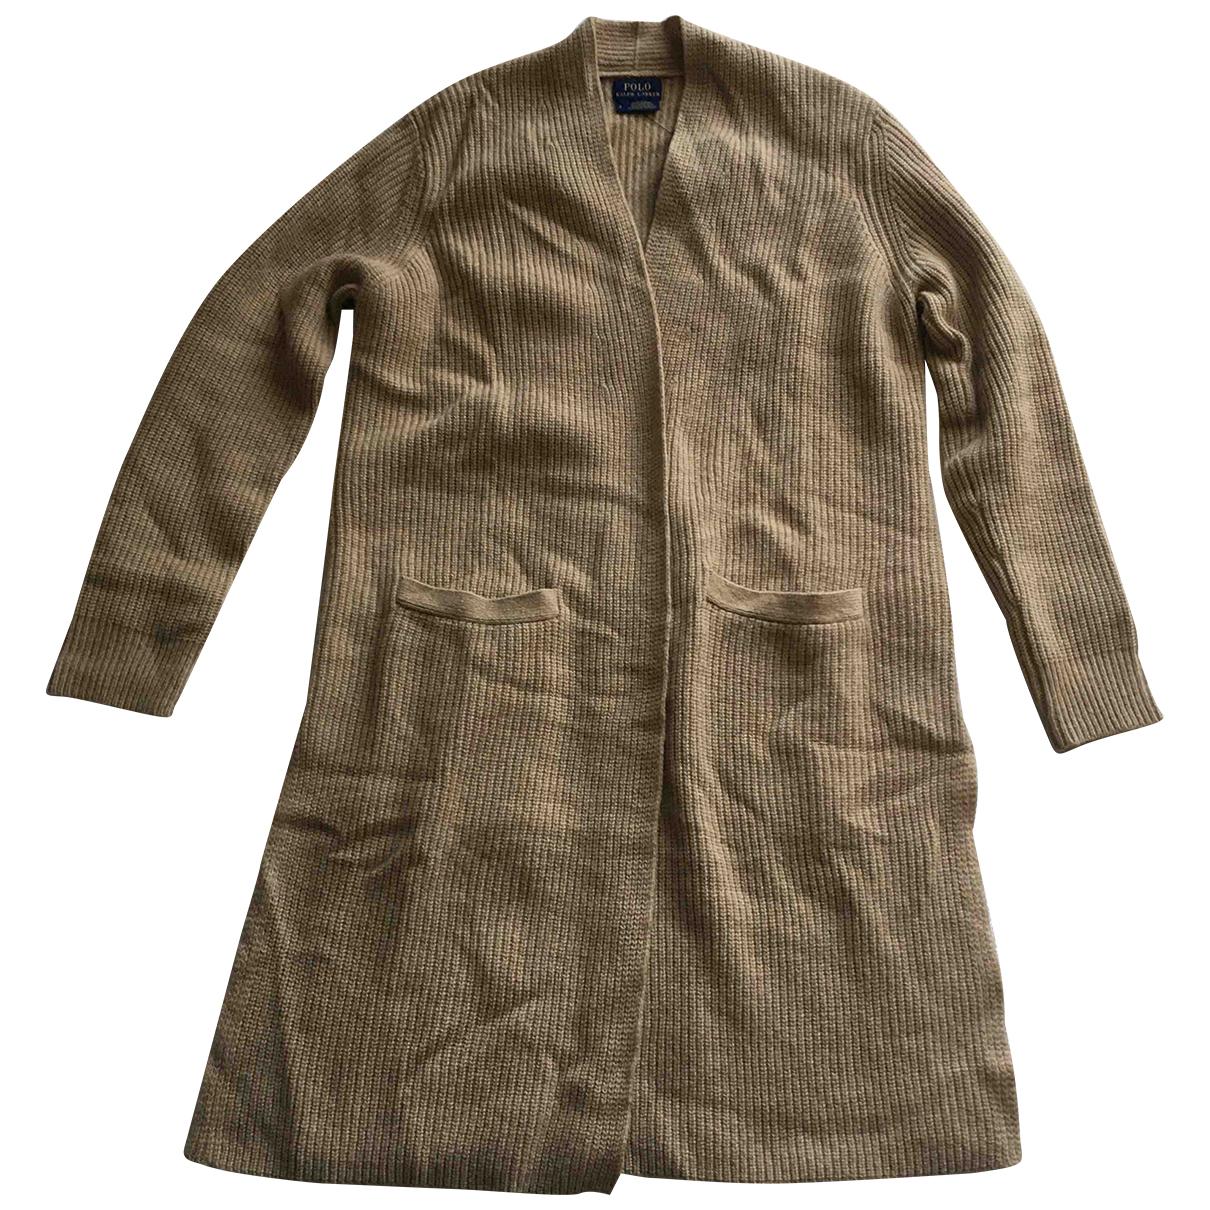 Polo Ralph Lauren \N Camel Cashmere Knitwear for Women S International